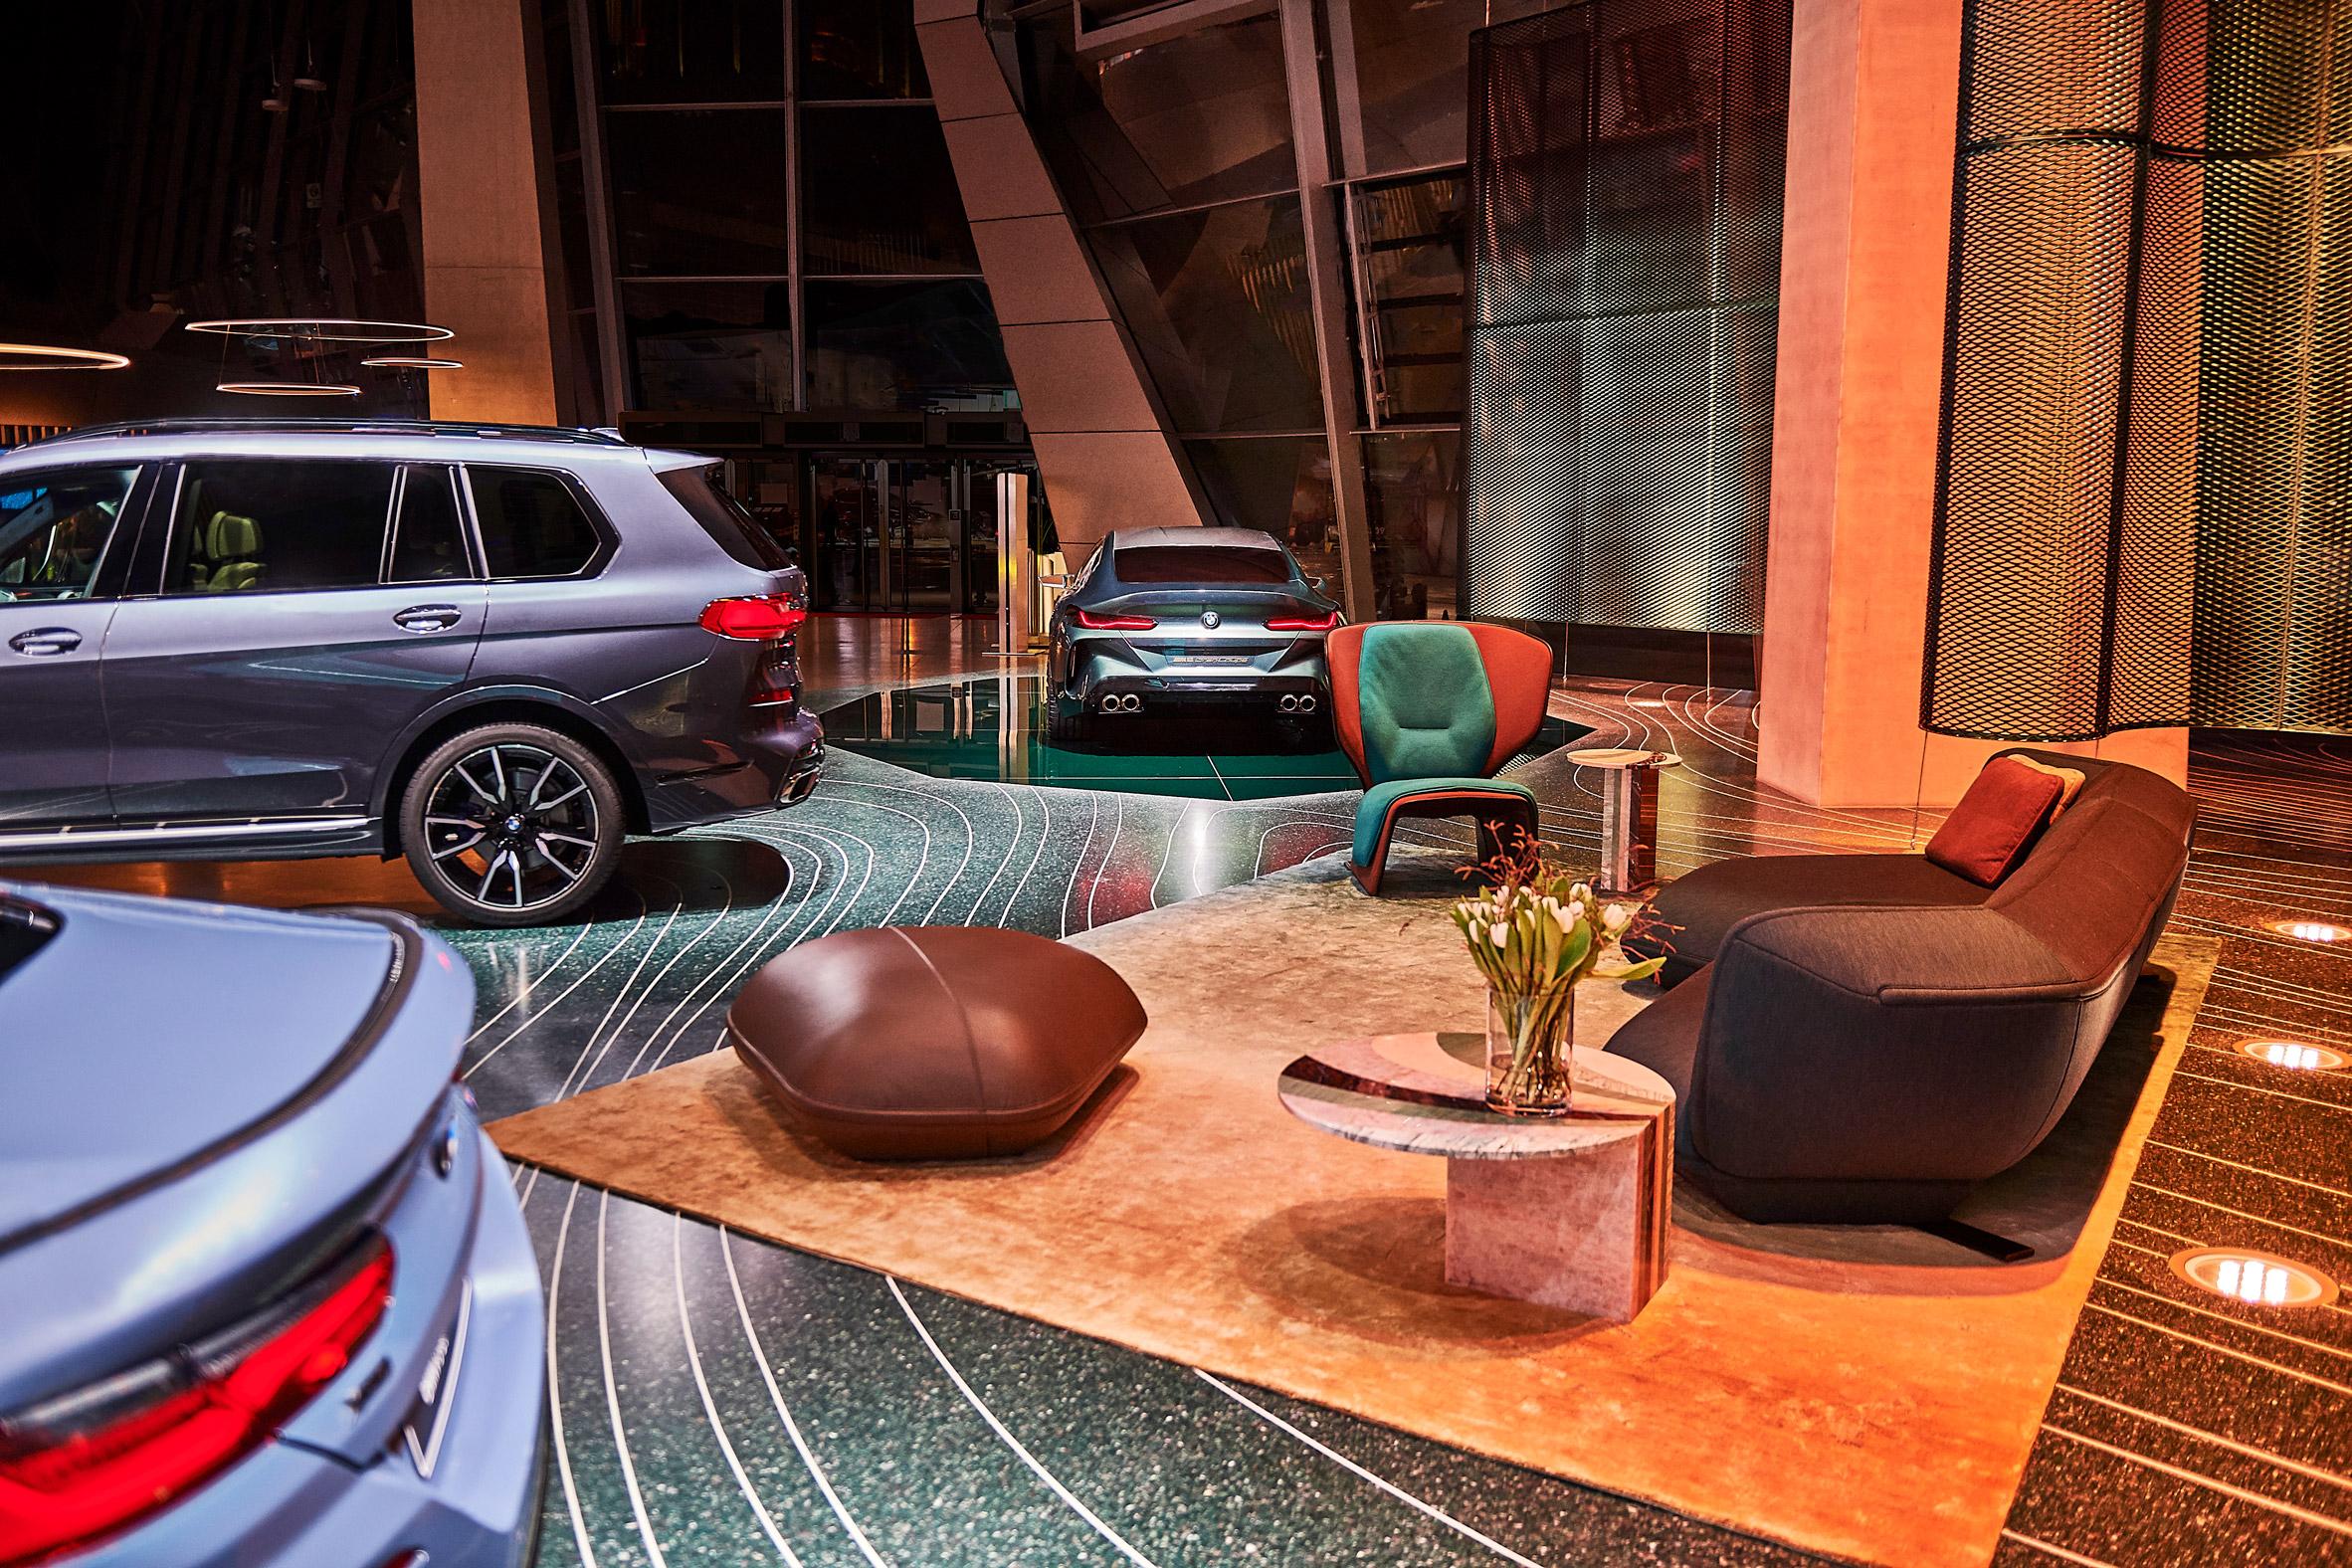 3d printing, 3D printing barcelona and mexico, Aectual, BMW, curso impresion 3d, impresión 3d, Patricia Urquiola, Pisos ecológicos, BMW Welt, M8 Gran Coupé, Materiales reciclados, Robotica,